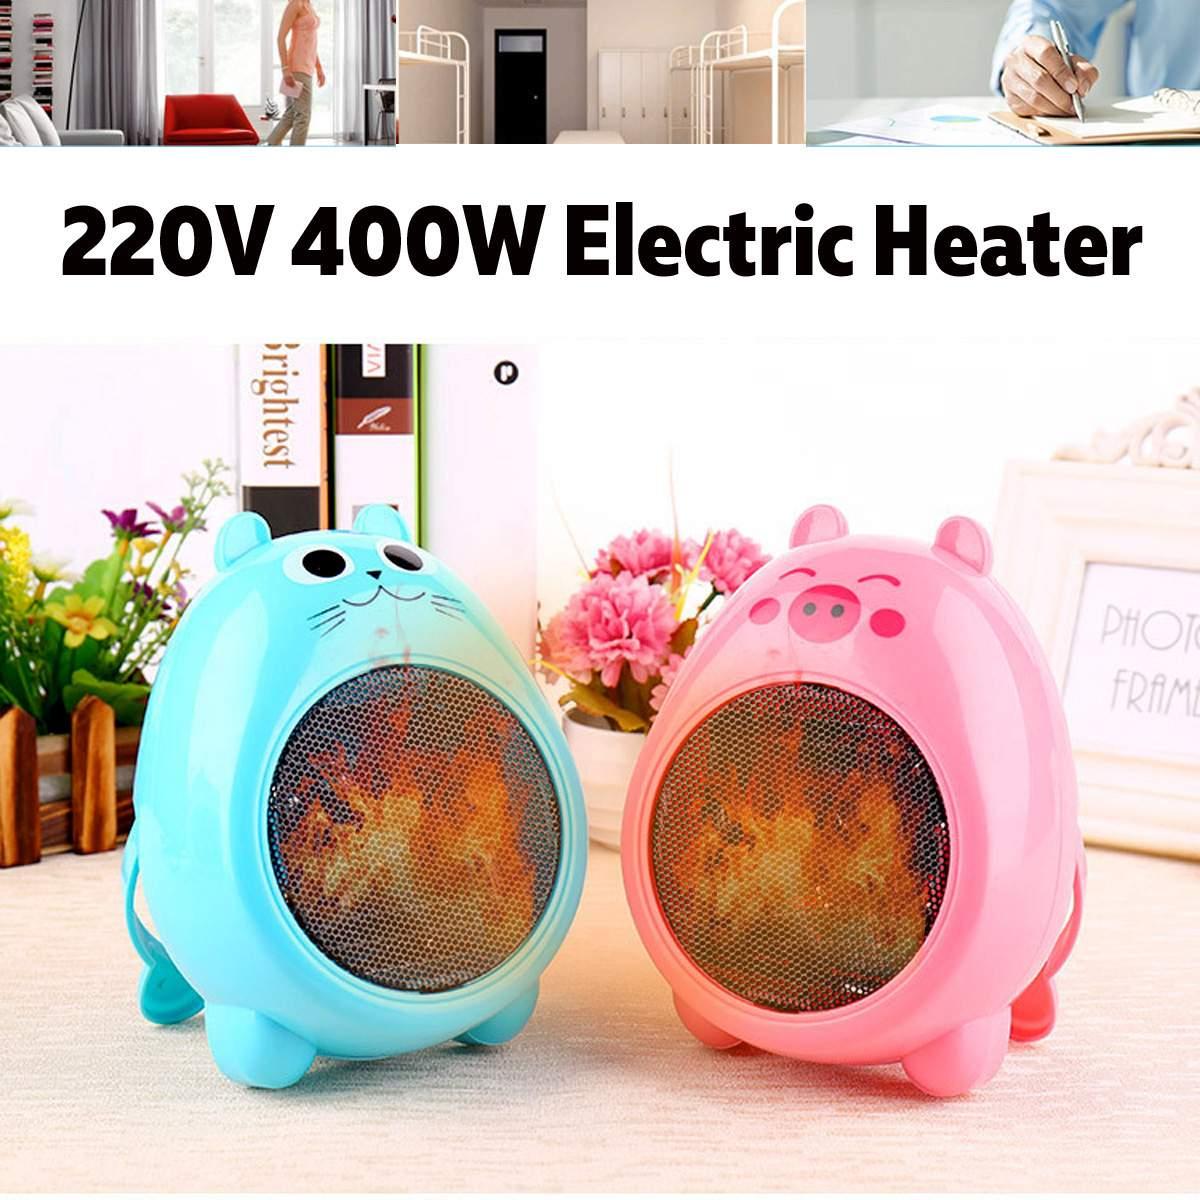 400W Mini Electric Heater Mini Fan Heater Portable Desktop Household Office Handy Heating Stove Radiator Warmer Machine Winter